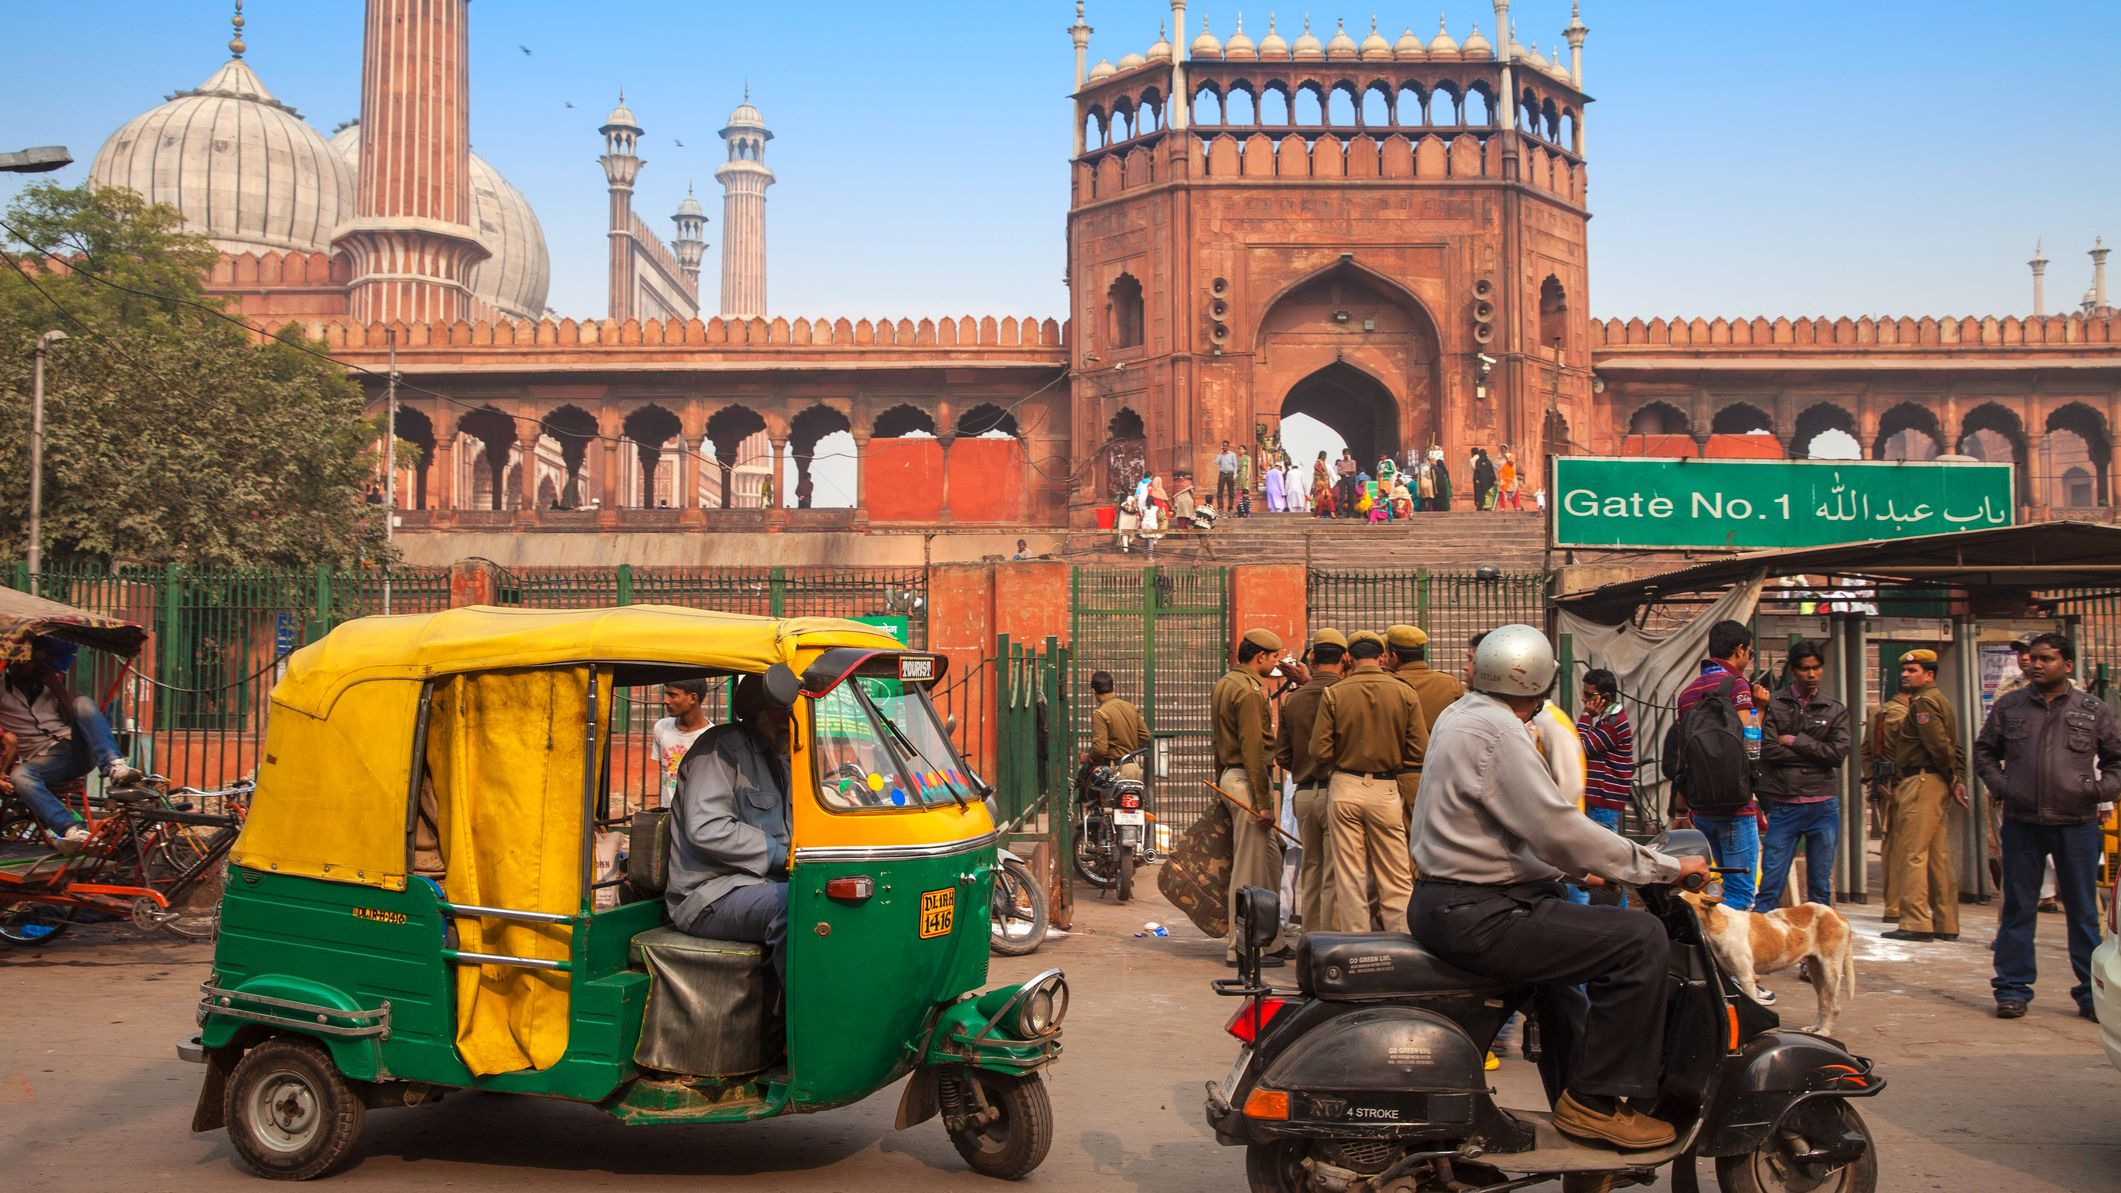 Delhi Auto Rickshaws and Fares: Essential Travel Guide